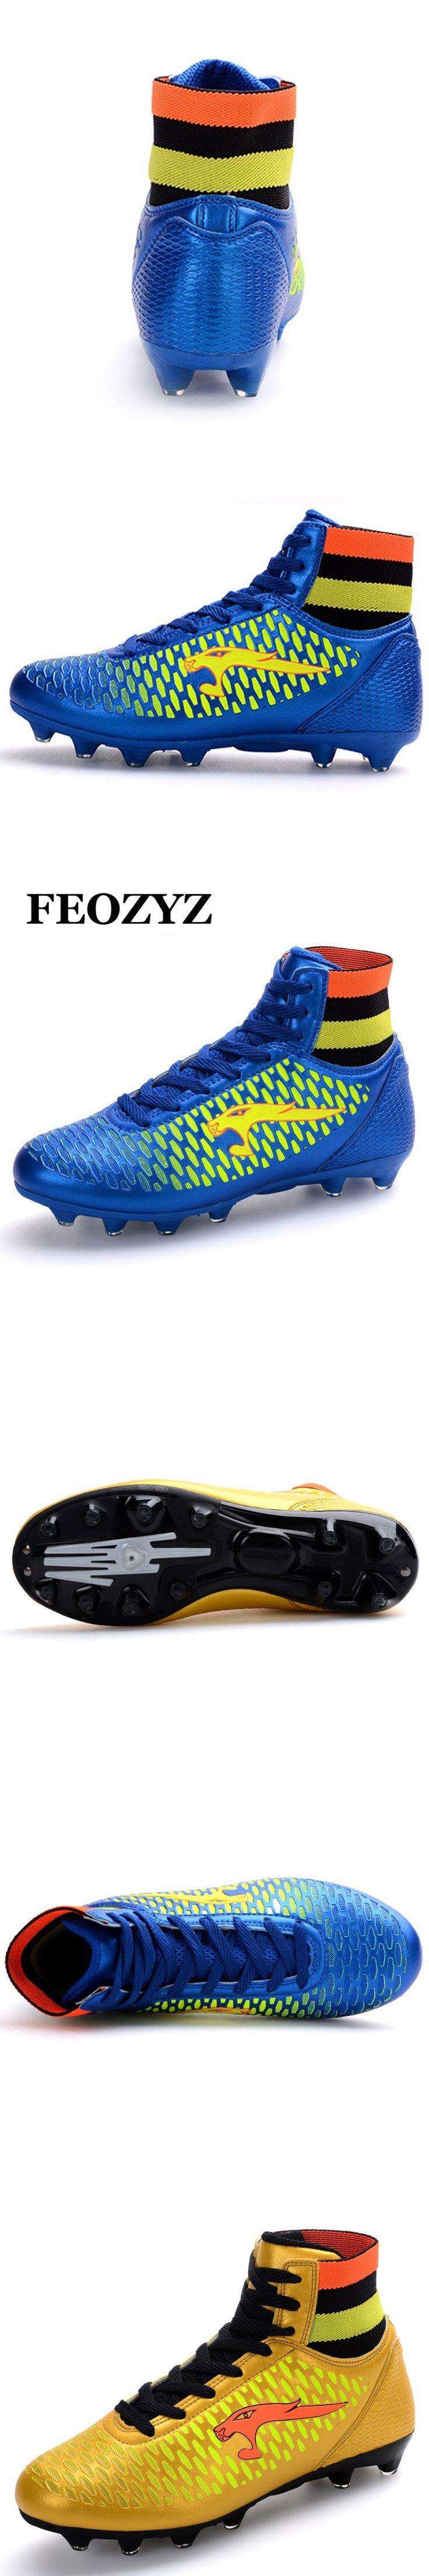 FEOZYZ Boys Kids Men Soccer Cleats High Ankle Football Shoes FG Soccer Boots Magista Botines Futbol Voetbal Schoenen Size 33-44